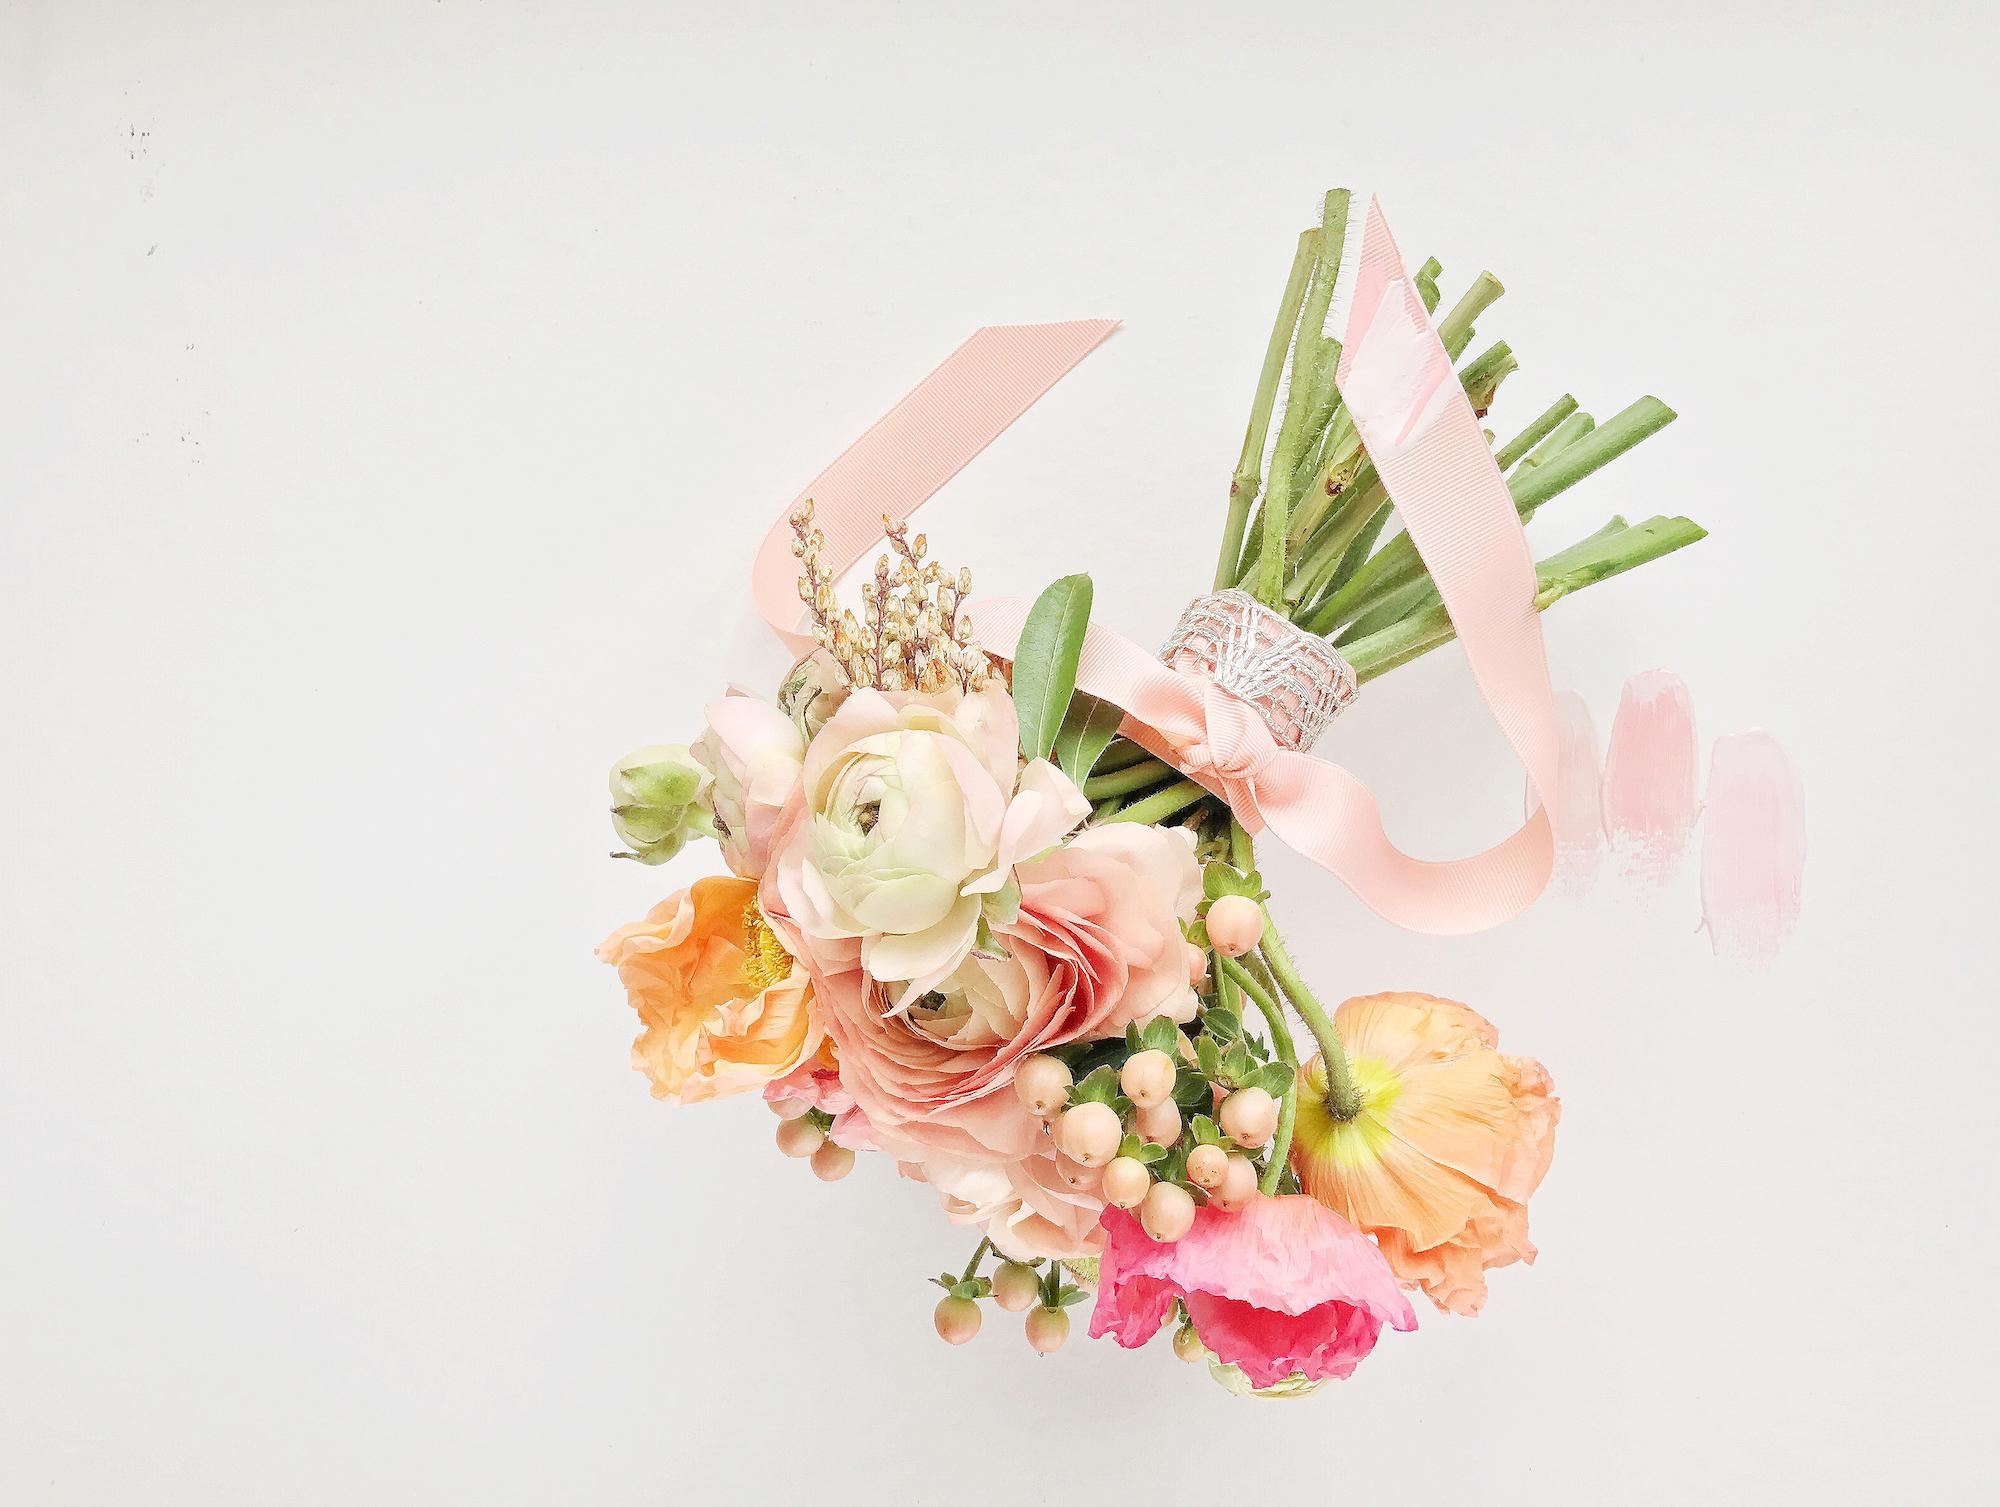 DIY spring bouquet for wedding, DIY bouquet